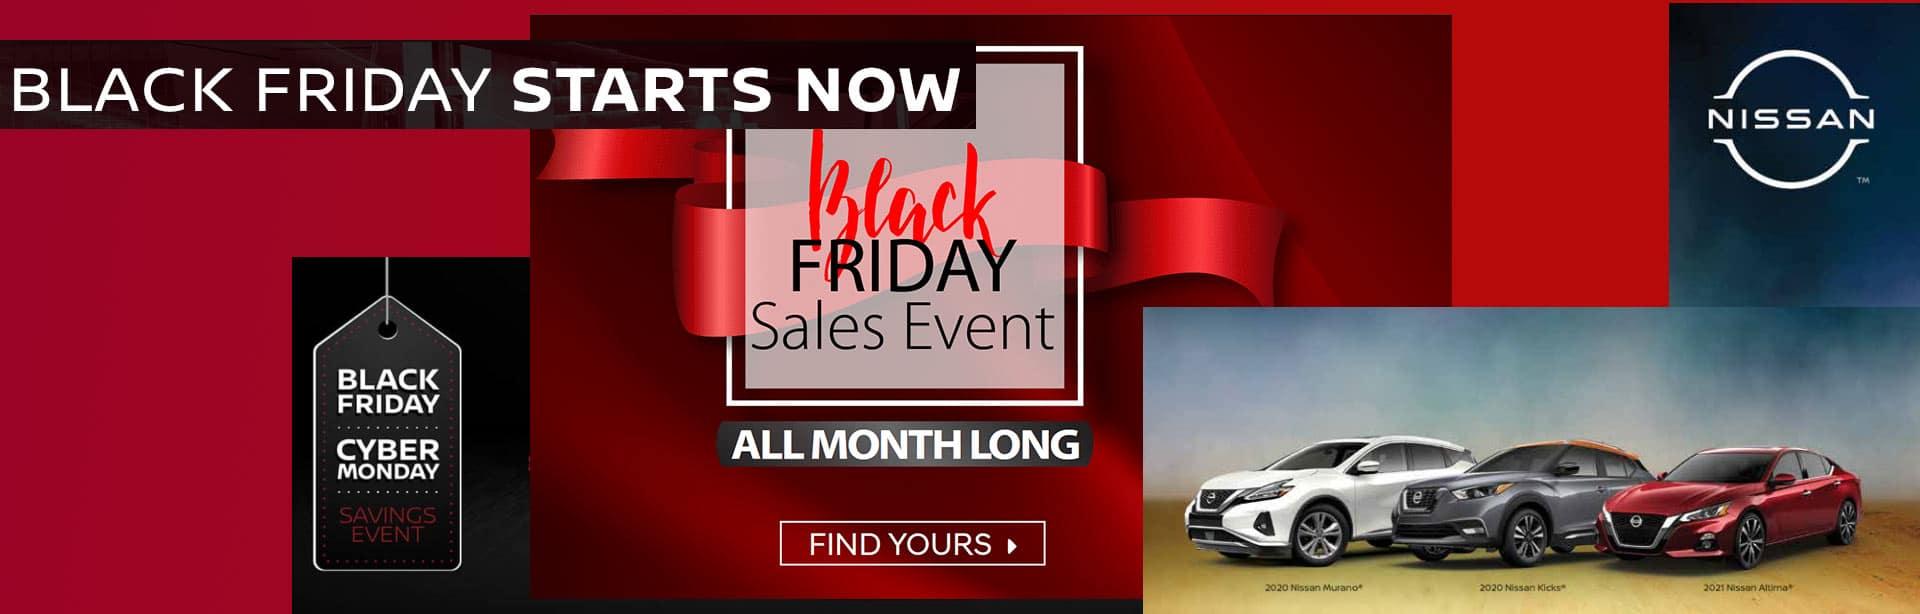 Nissan Black Friday